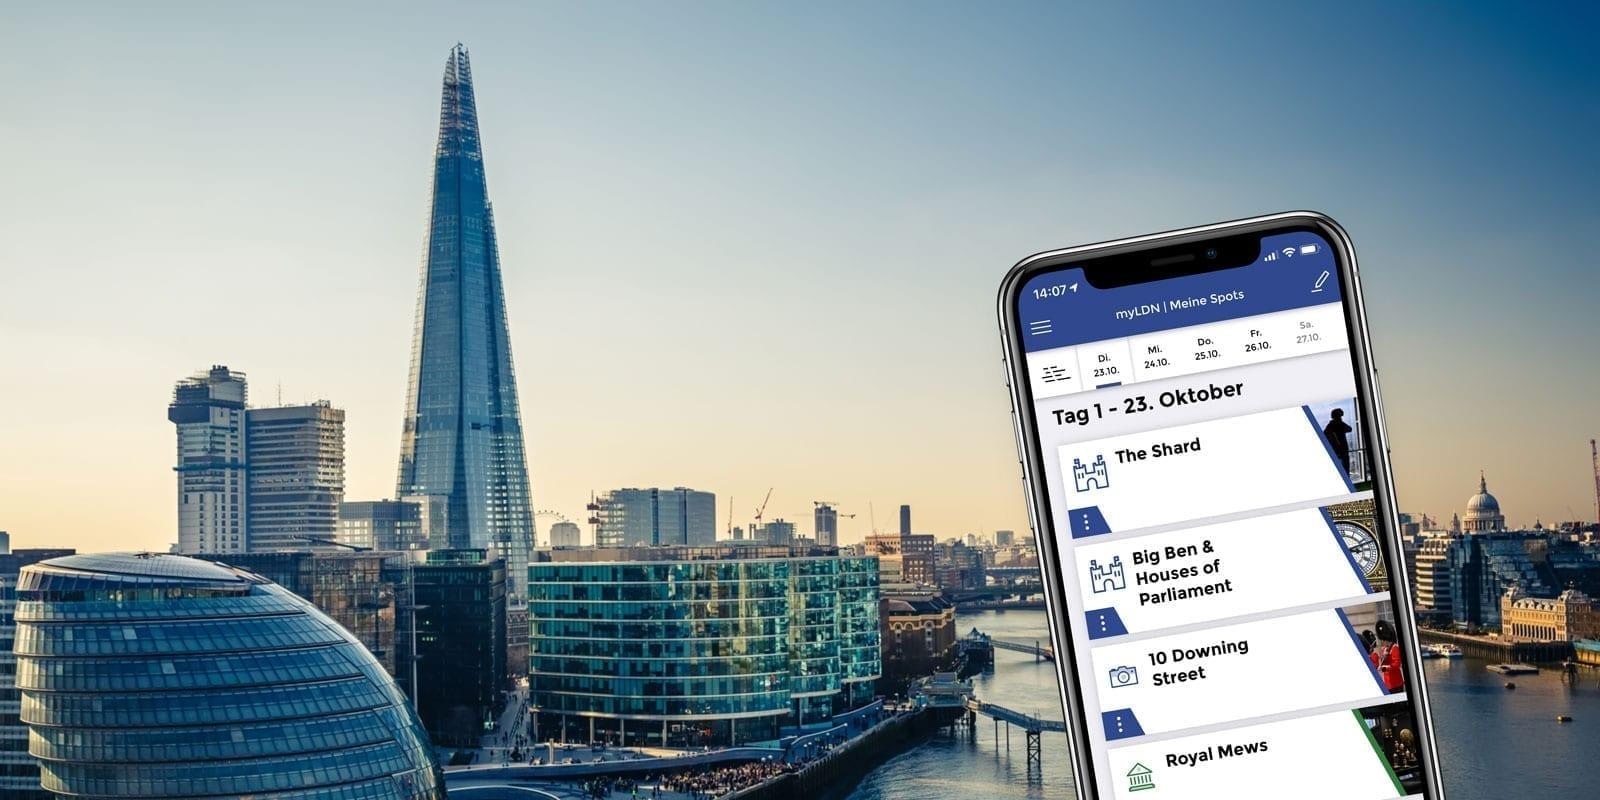 myLDN Loving London App